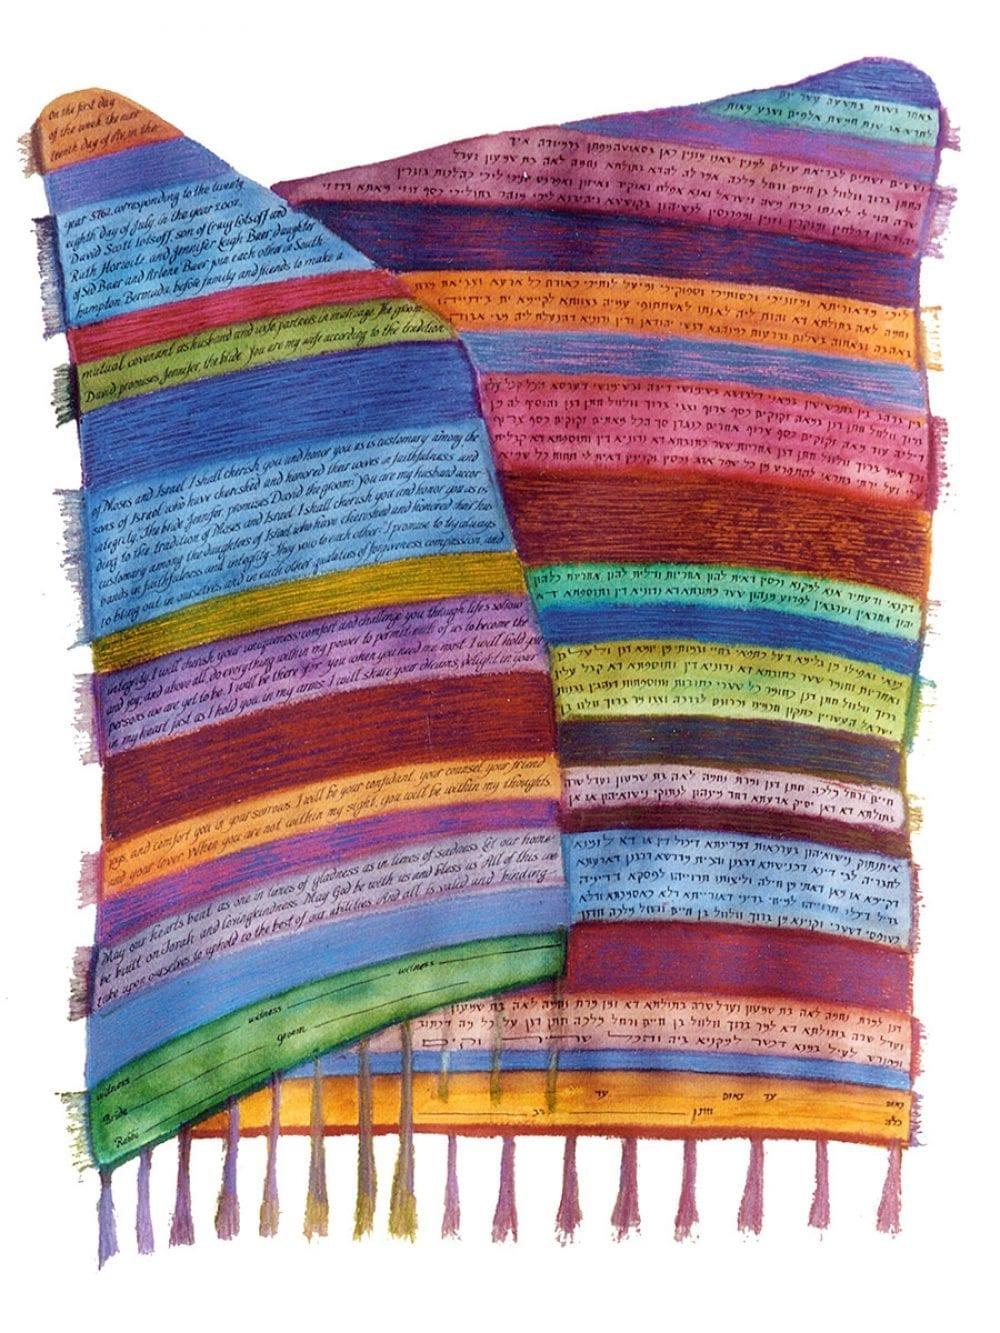 2-sided-variegated-tallit-weaving-ketubah